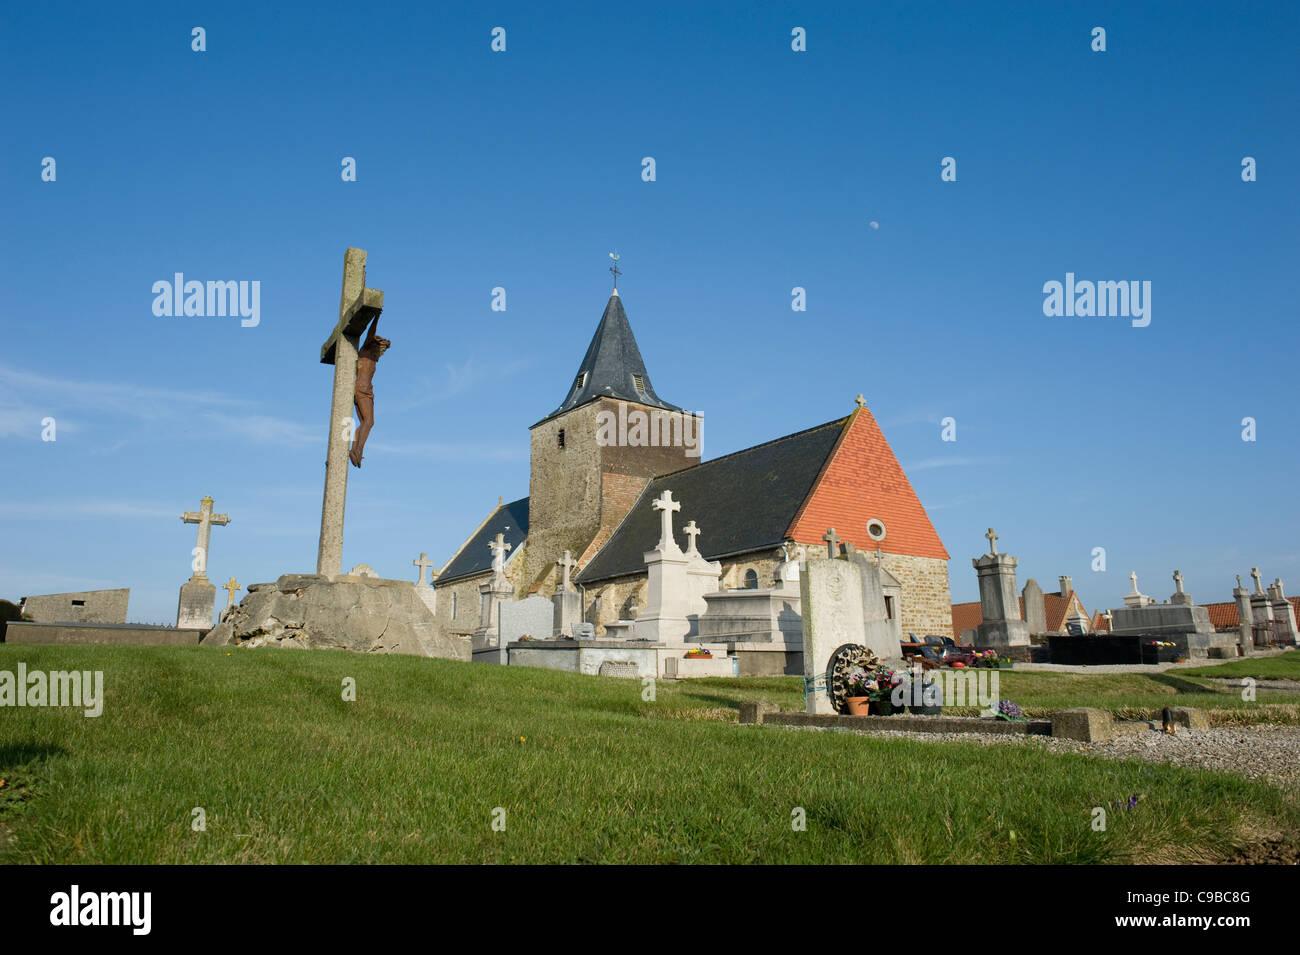 Church of St-Eloi in Bazinghen near Calais at the Côte Opale in Pas-de-Calais, Northern France, - Stock Image